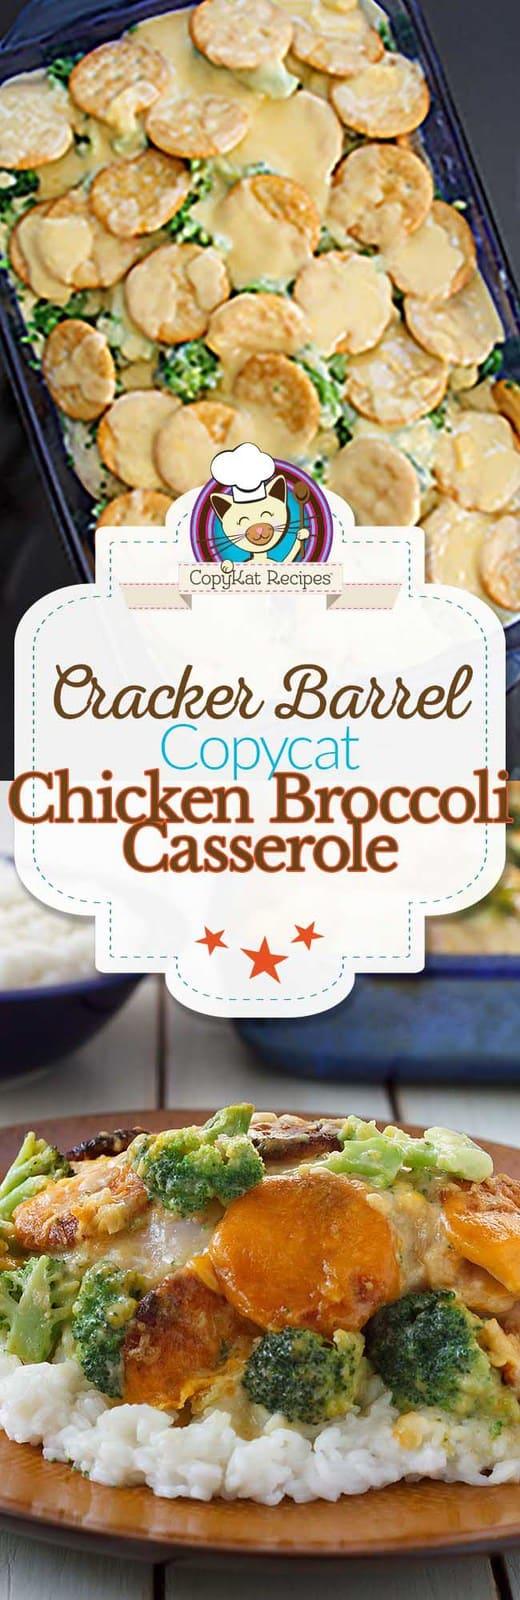 Cracker Barrel Broccoli Cheddar Chicken